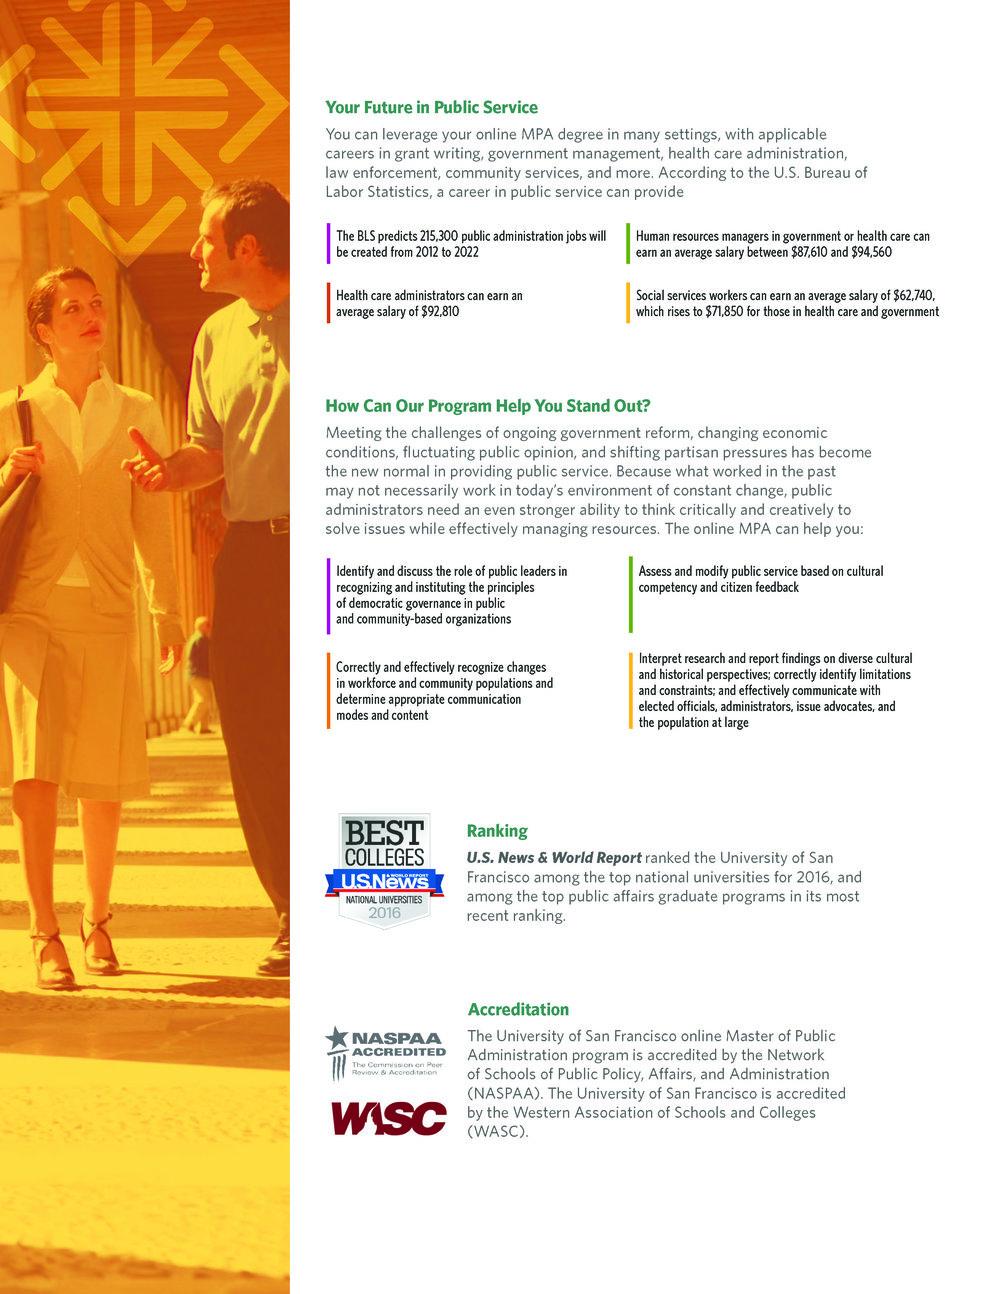 USFMPA Brochure20160324_901p_Page_3.jpg